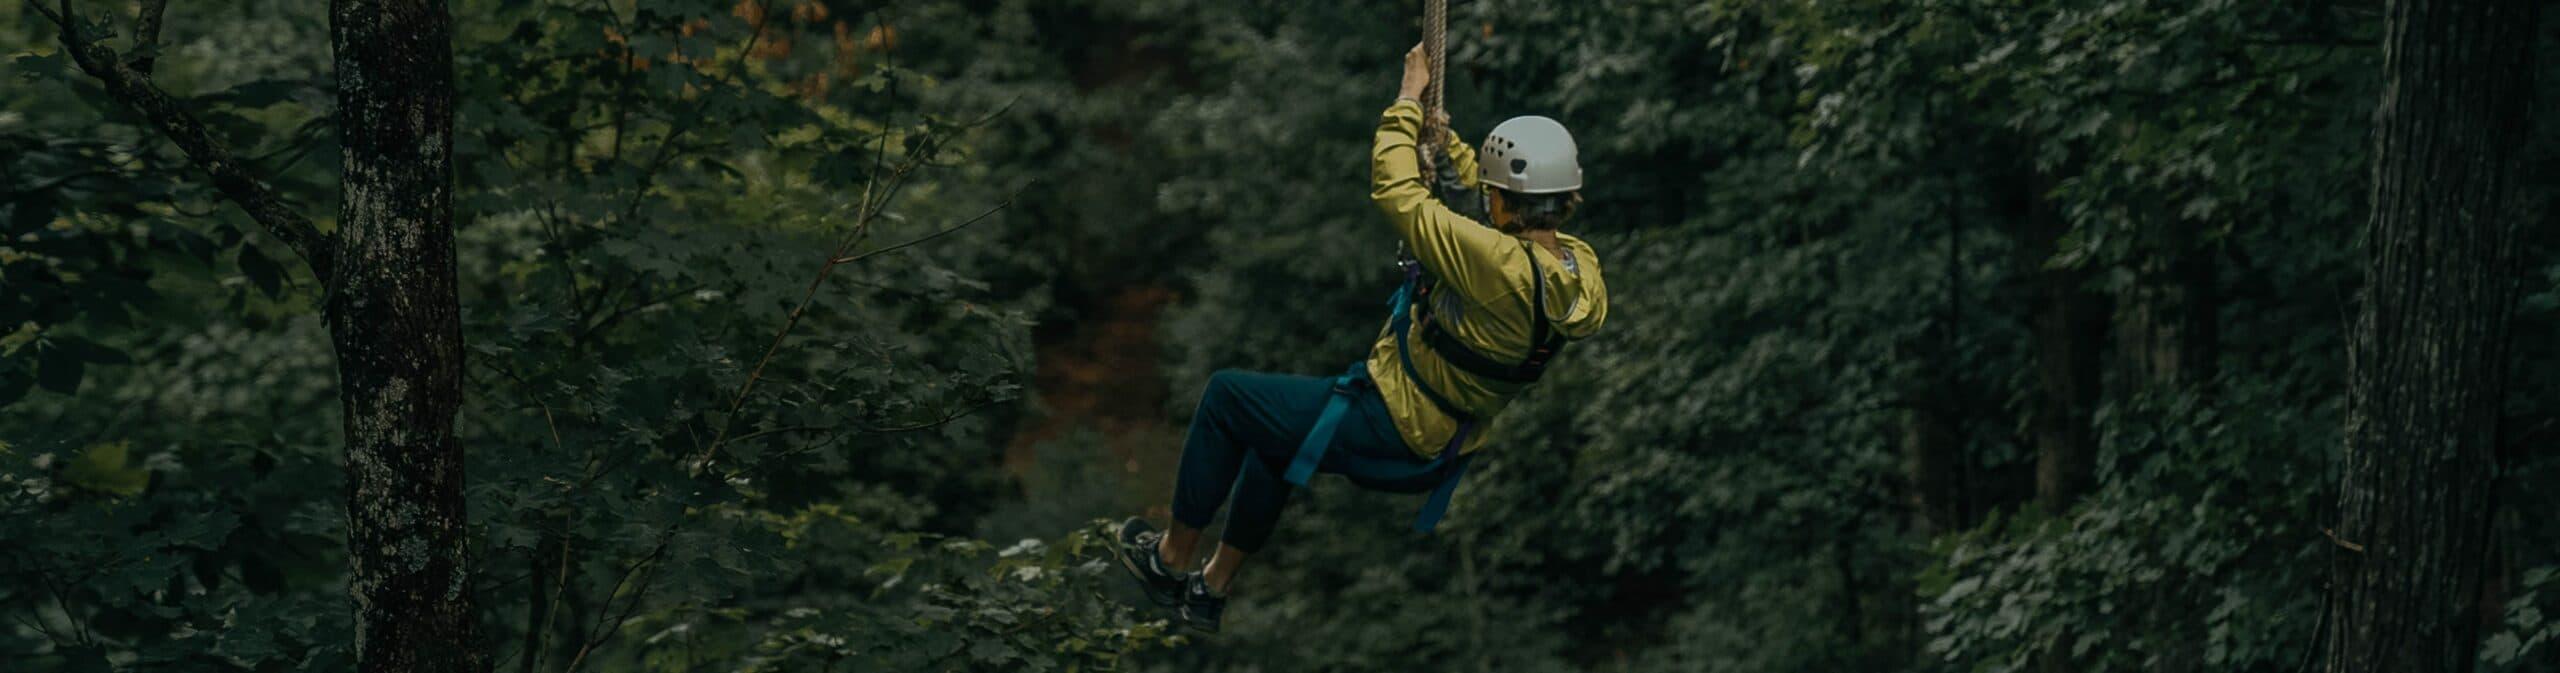 Woman zip lining through trees